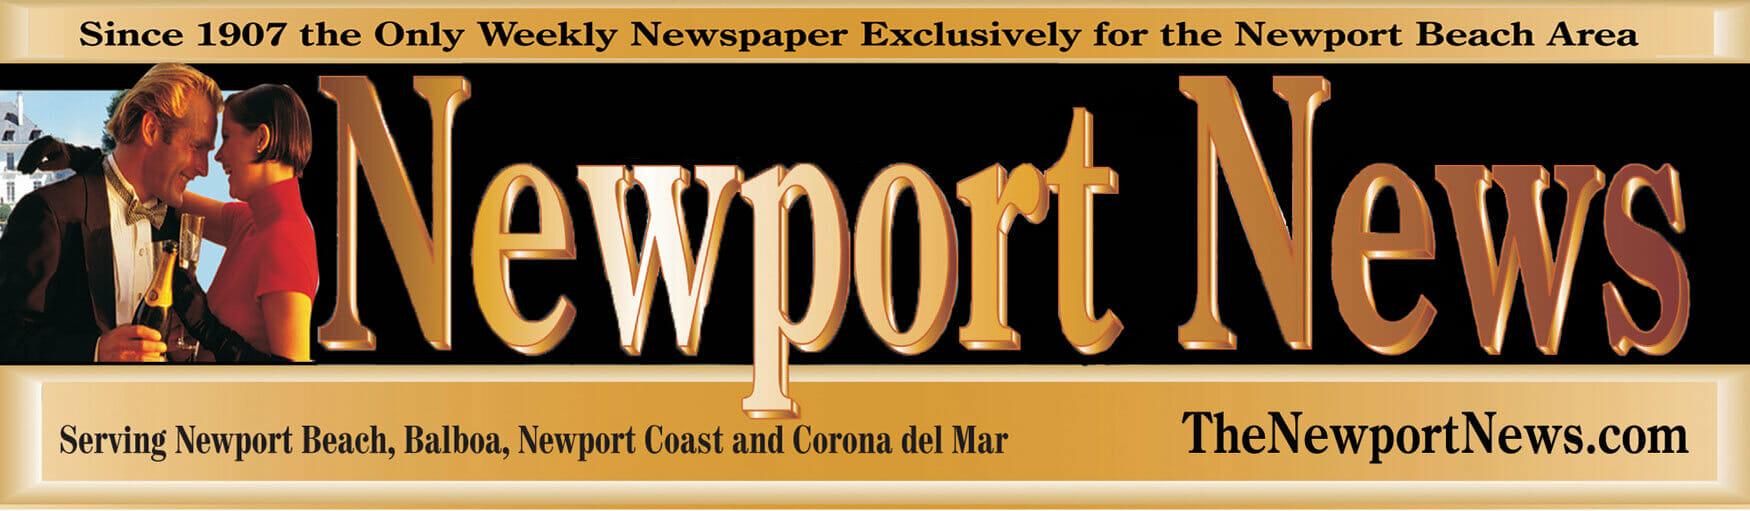 The Newport News